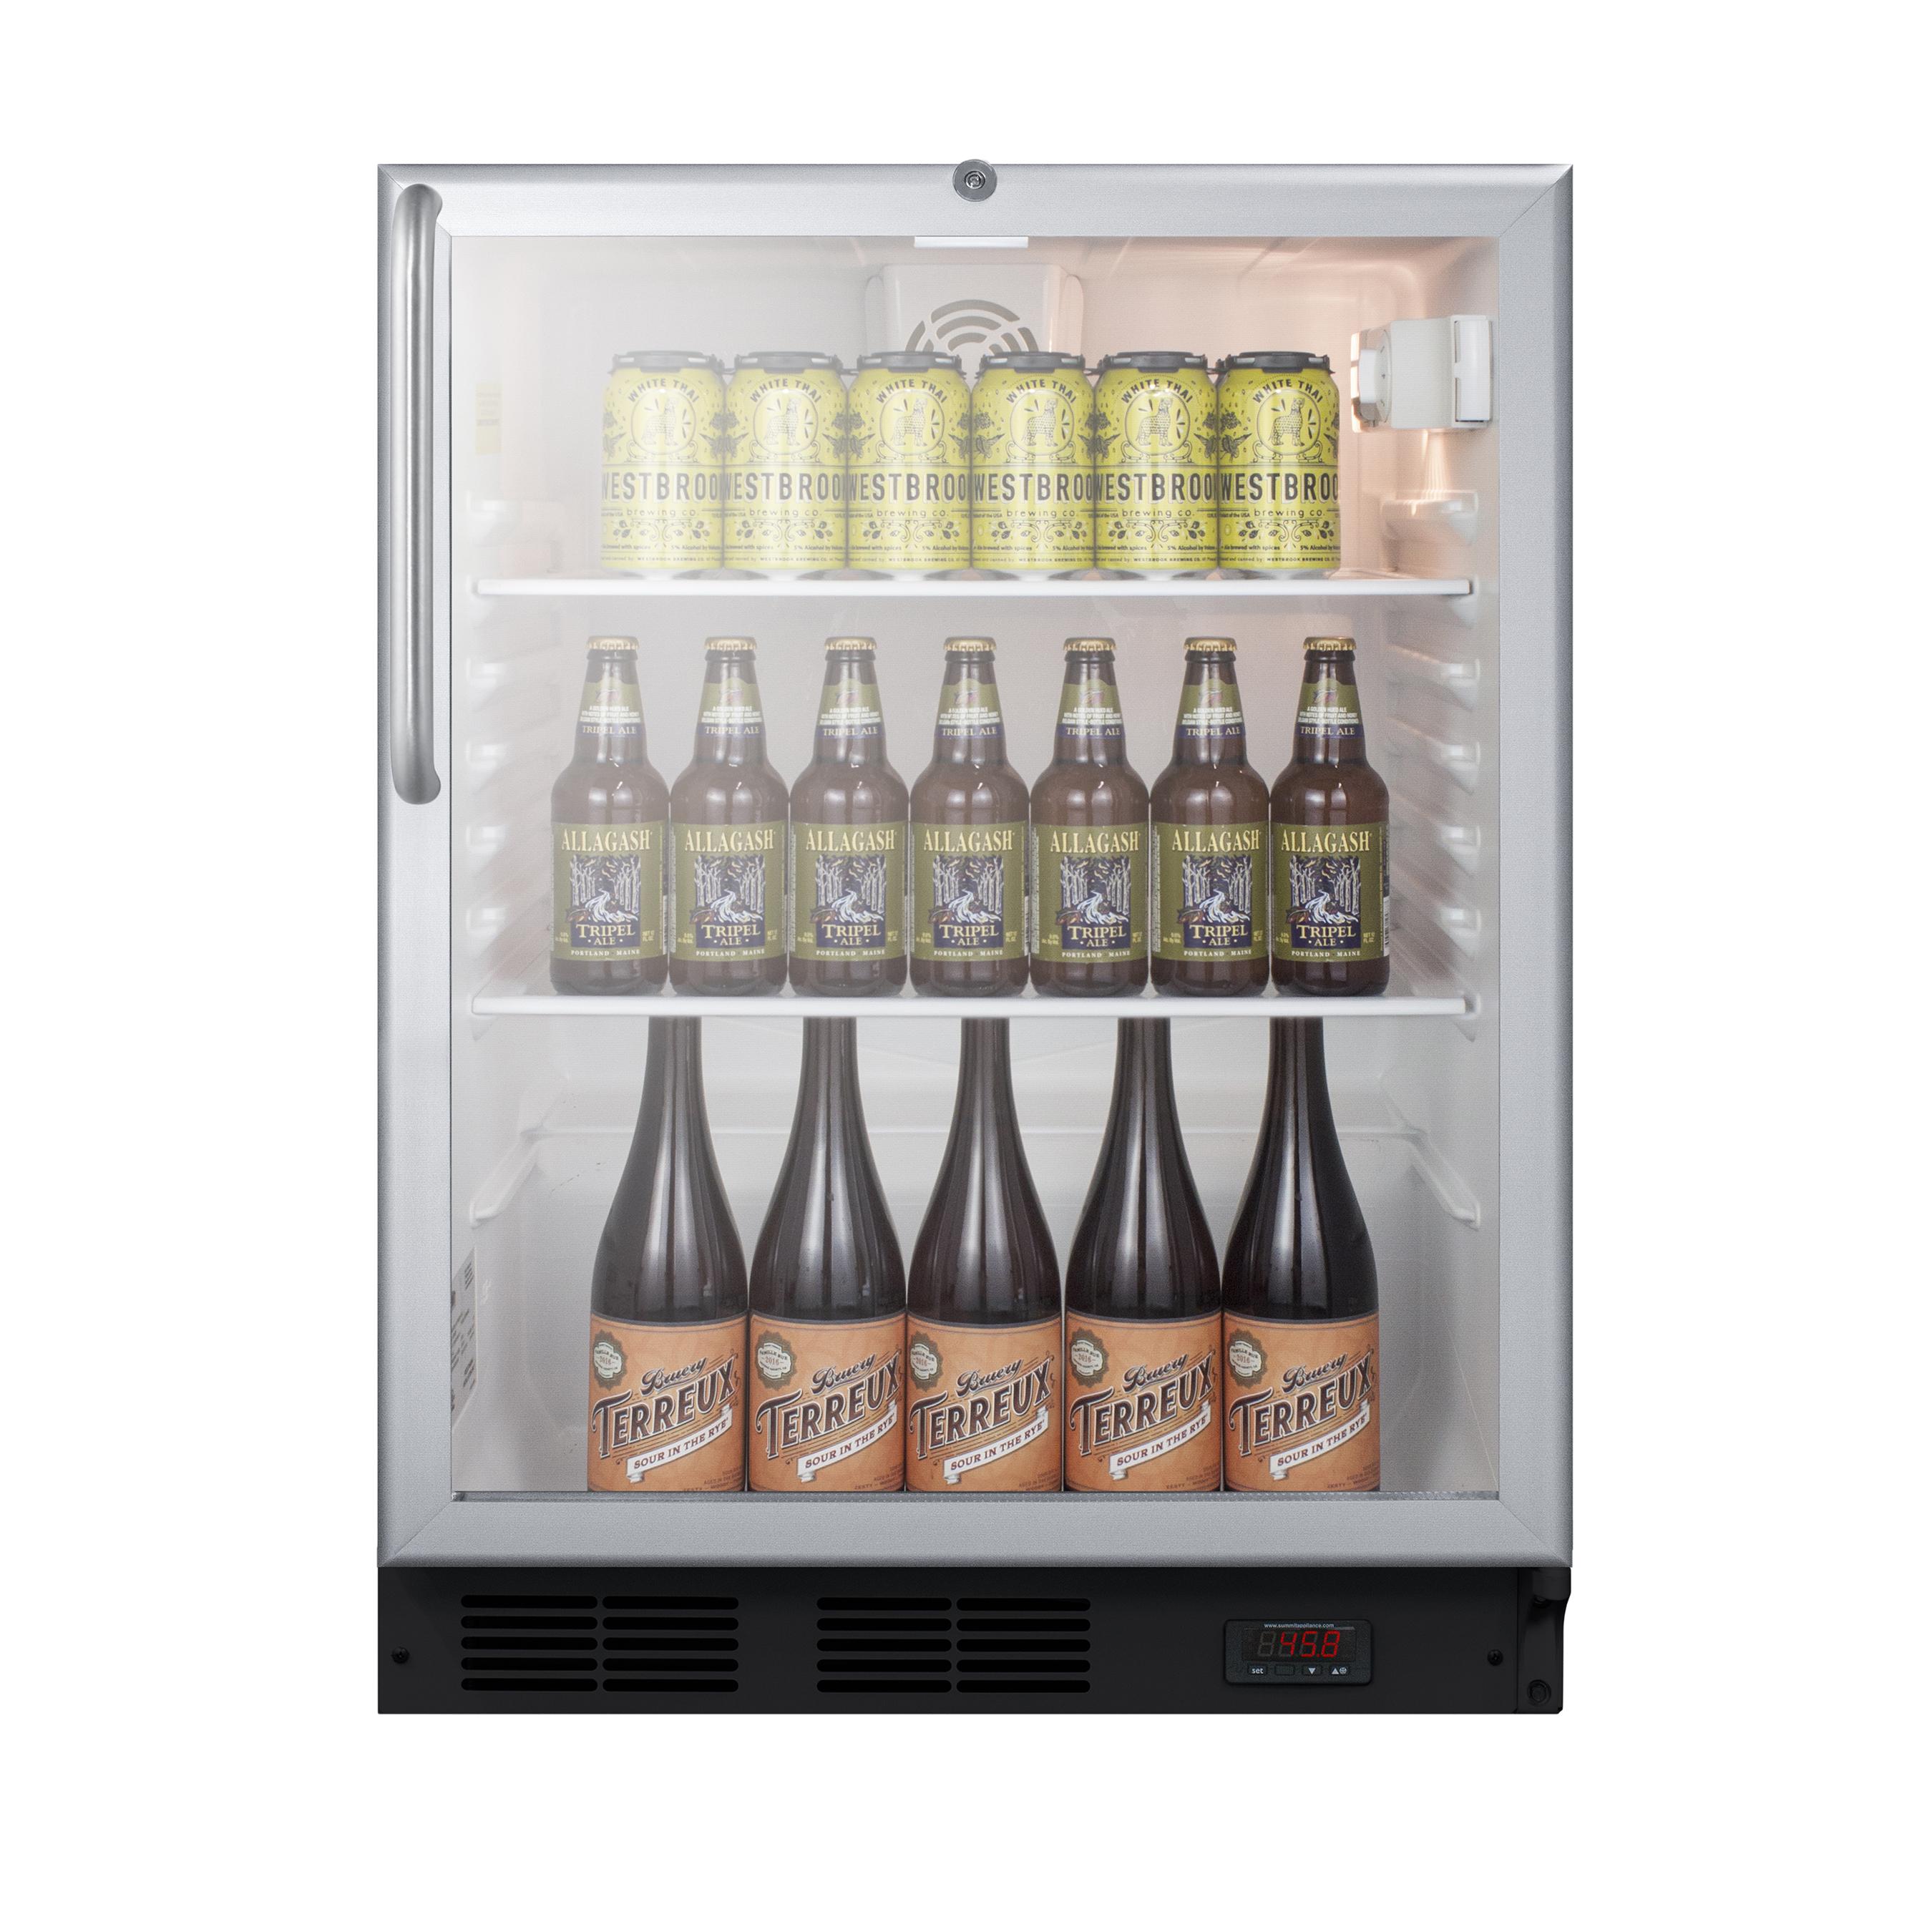 Summit Appliance SCR600BGLDTPUBCSS refrigerator, merchandiser, countertop